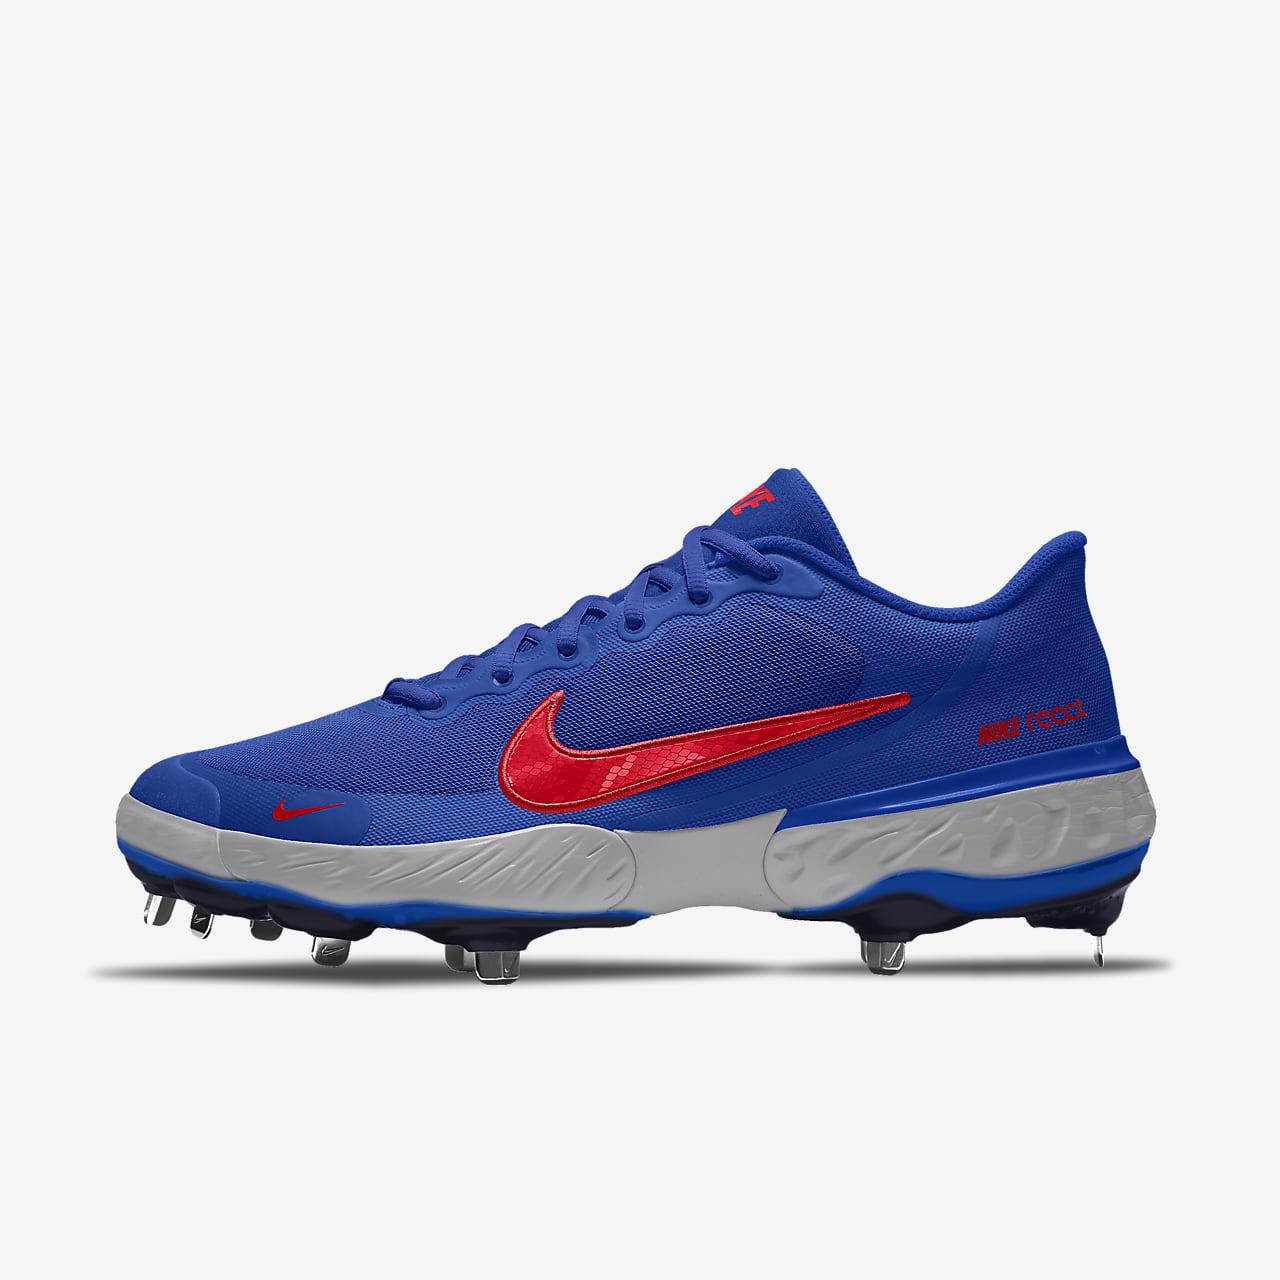 Chaussure de baseball à crampons personnalisable Nike Alpha Huarache Elite 3 Low By You